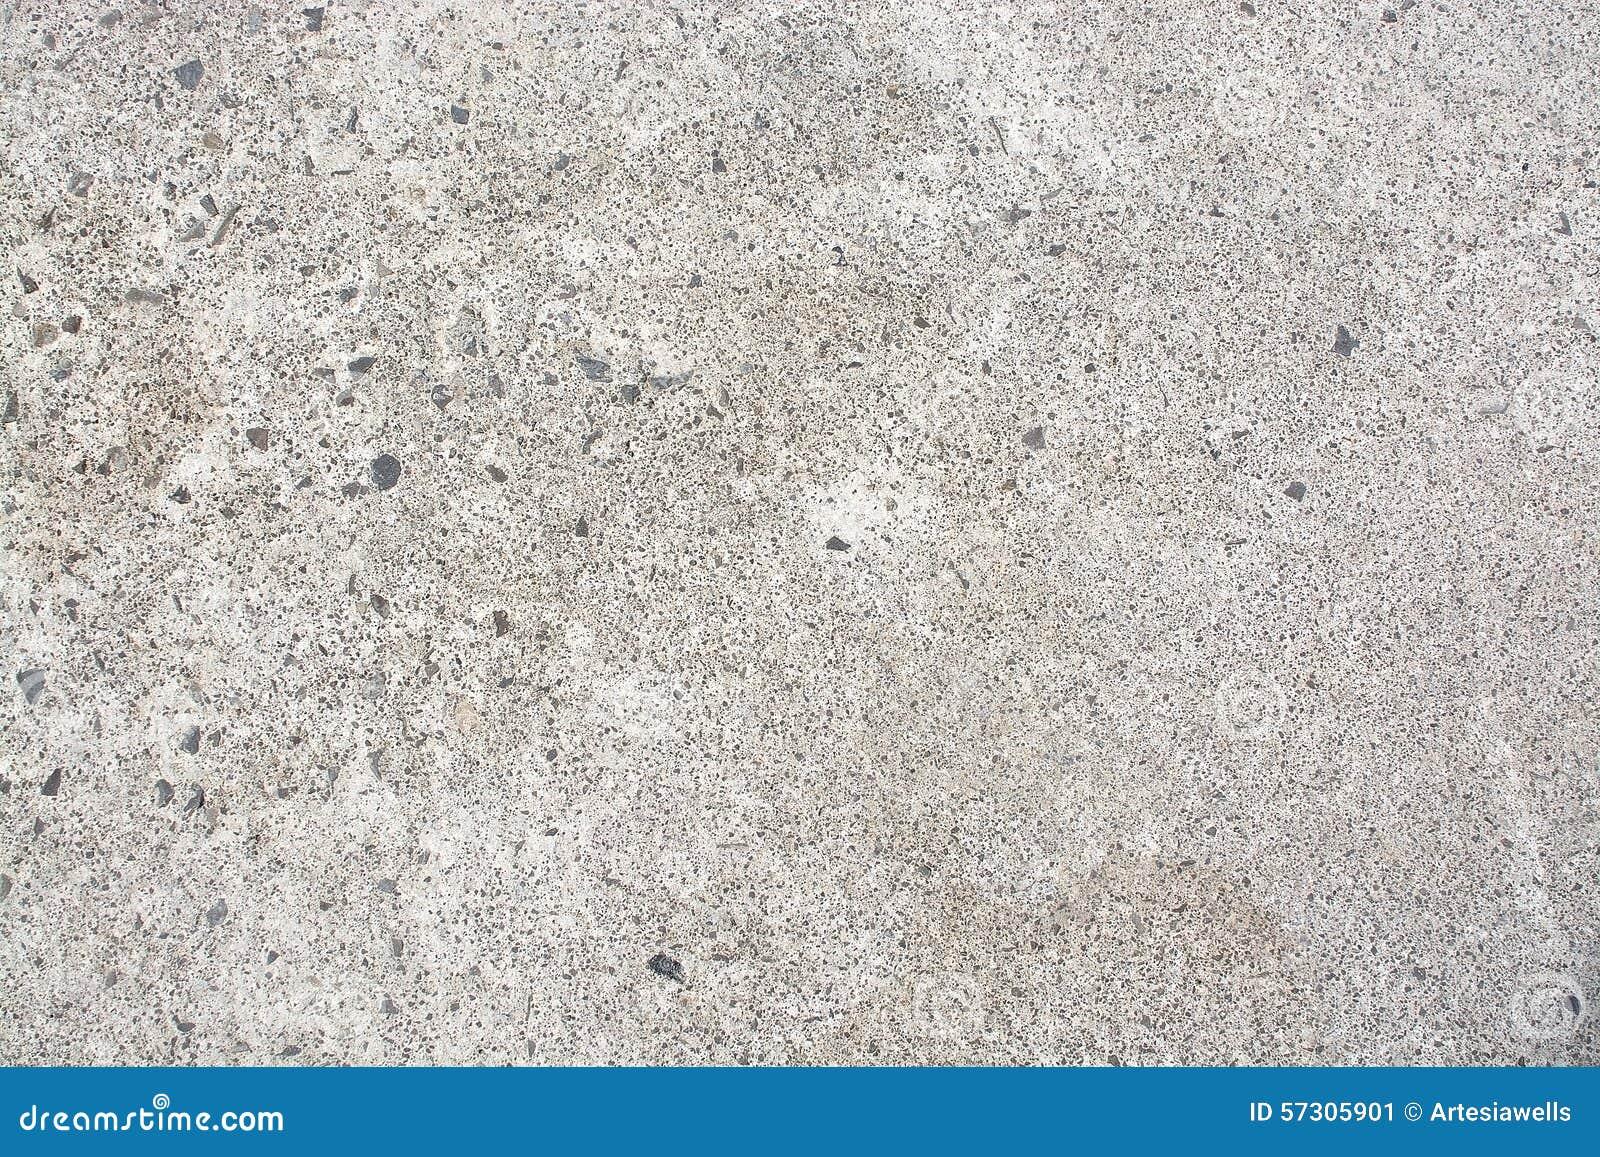 texture sale de fond de cr pi ou de stuc photo stock image 57305901. Black Bedroom Furniture Sets. Home Design Ideas